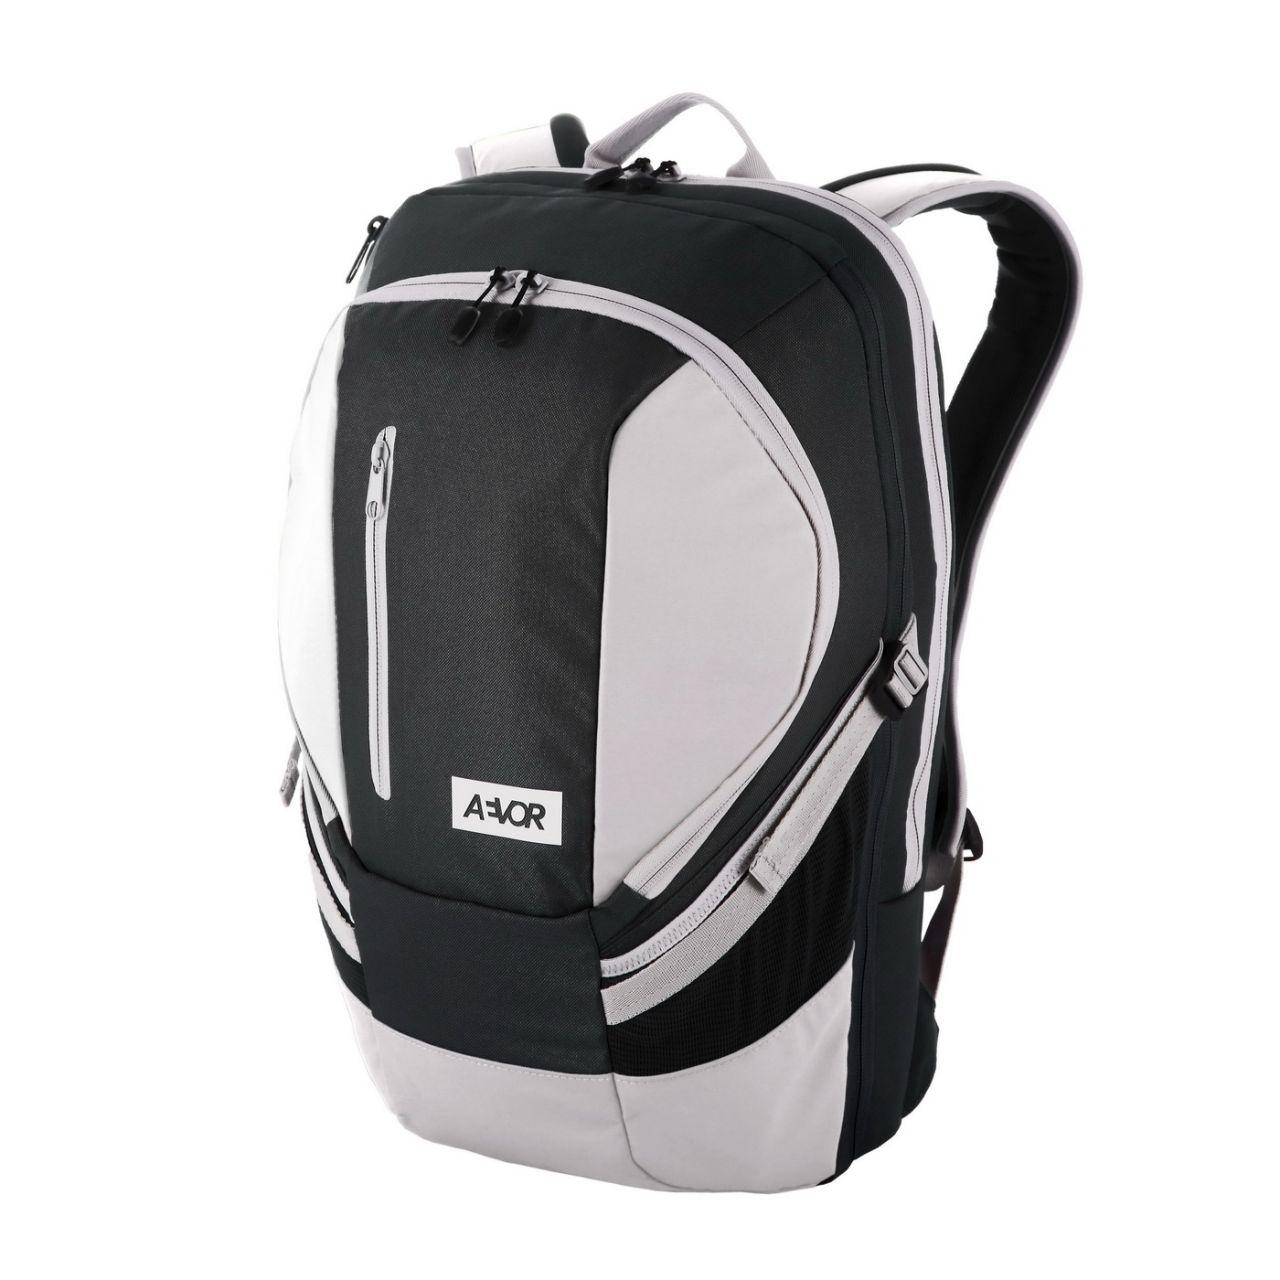 Aevor Rucksack Sportspack BPM/001 26l foggy black AVR/BPM/001/801A